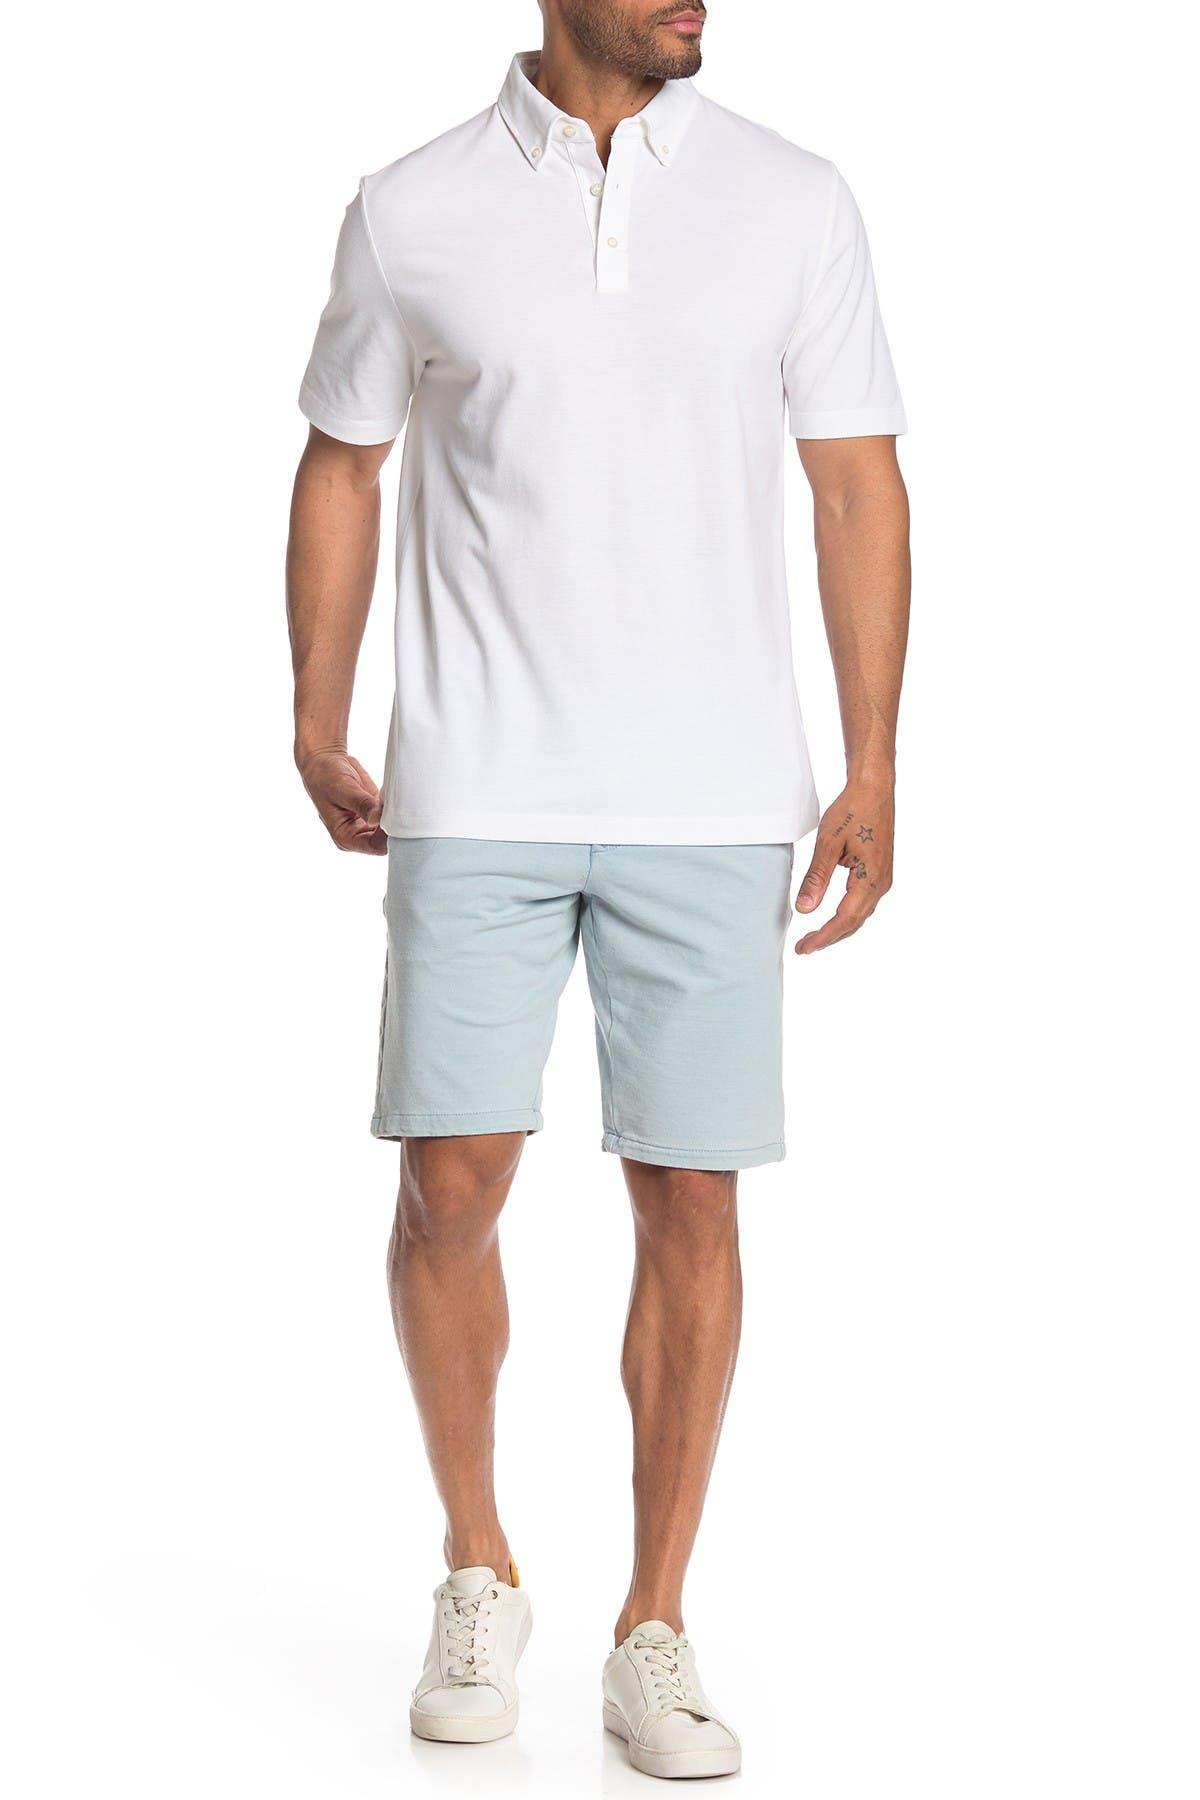 Image of Thomas Dean Solid Knit Shorts